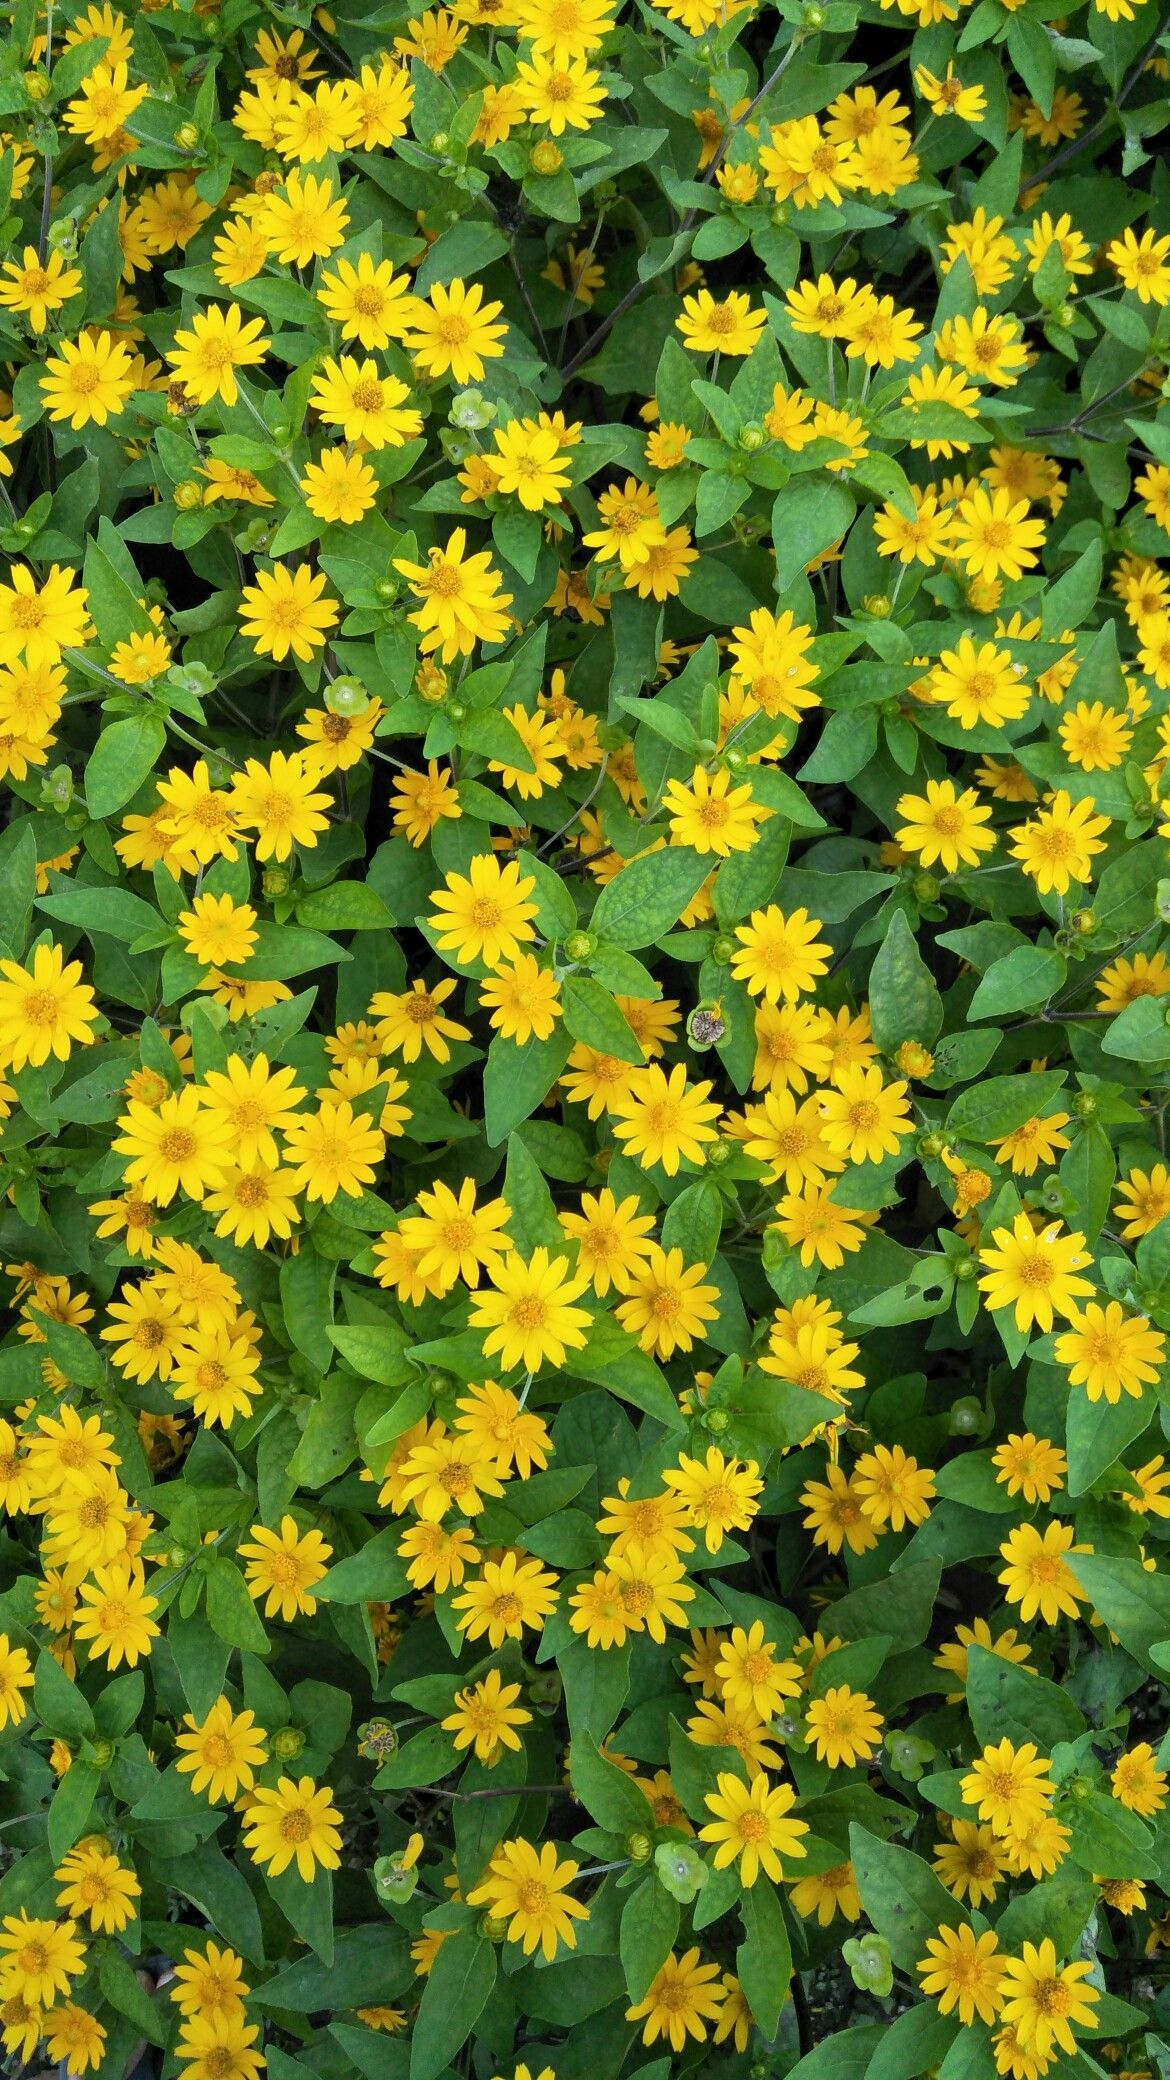 Bunga Kuning Berdaun Hijau Saya Tak Tahu Namanya Bunga Kuning Bunga Gambar Mode